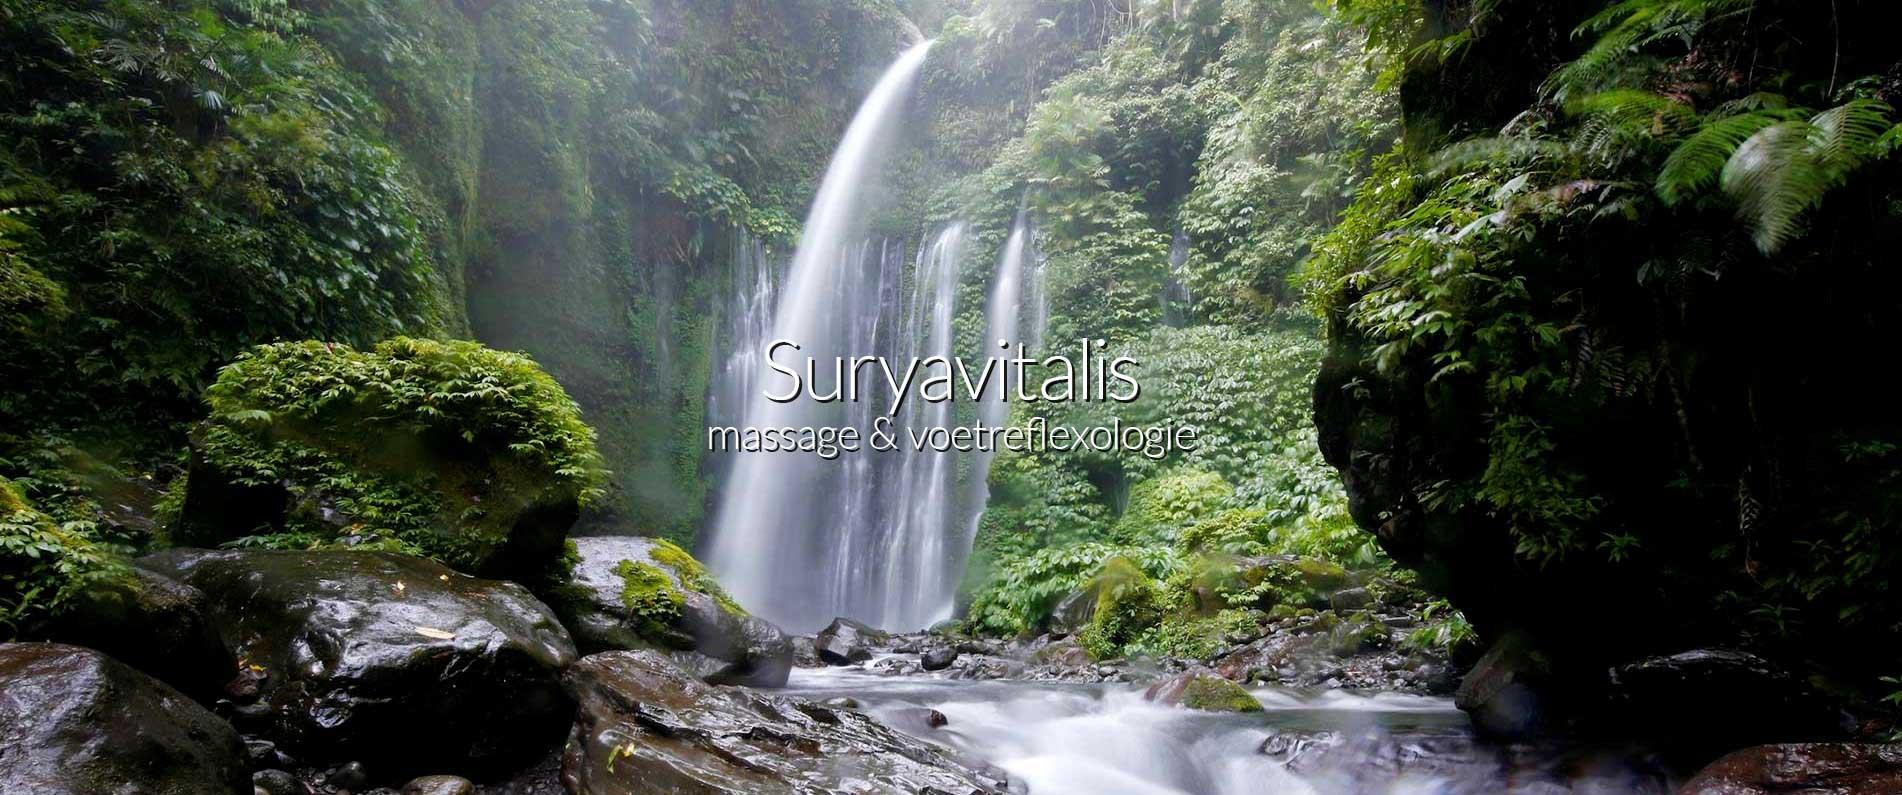 Suryavitalis